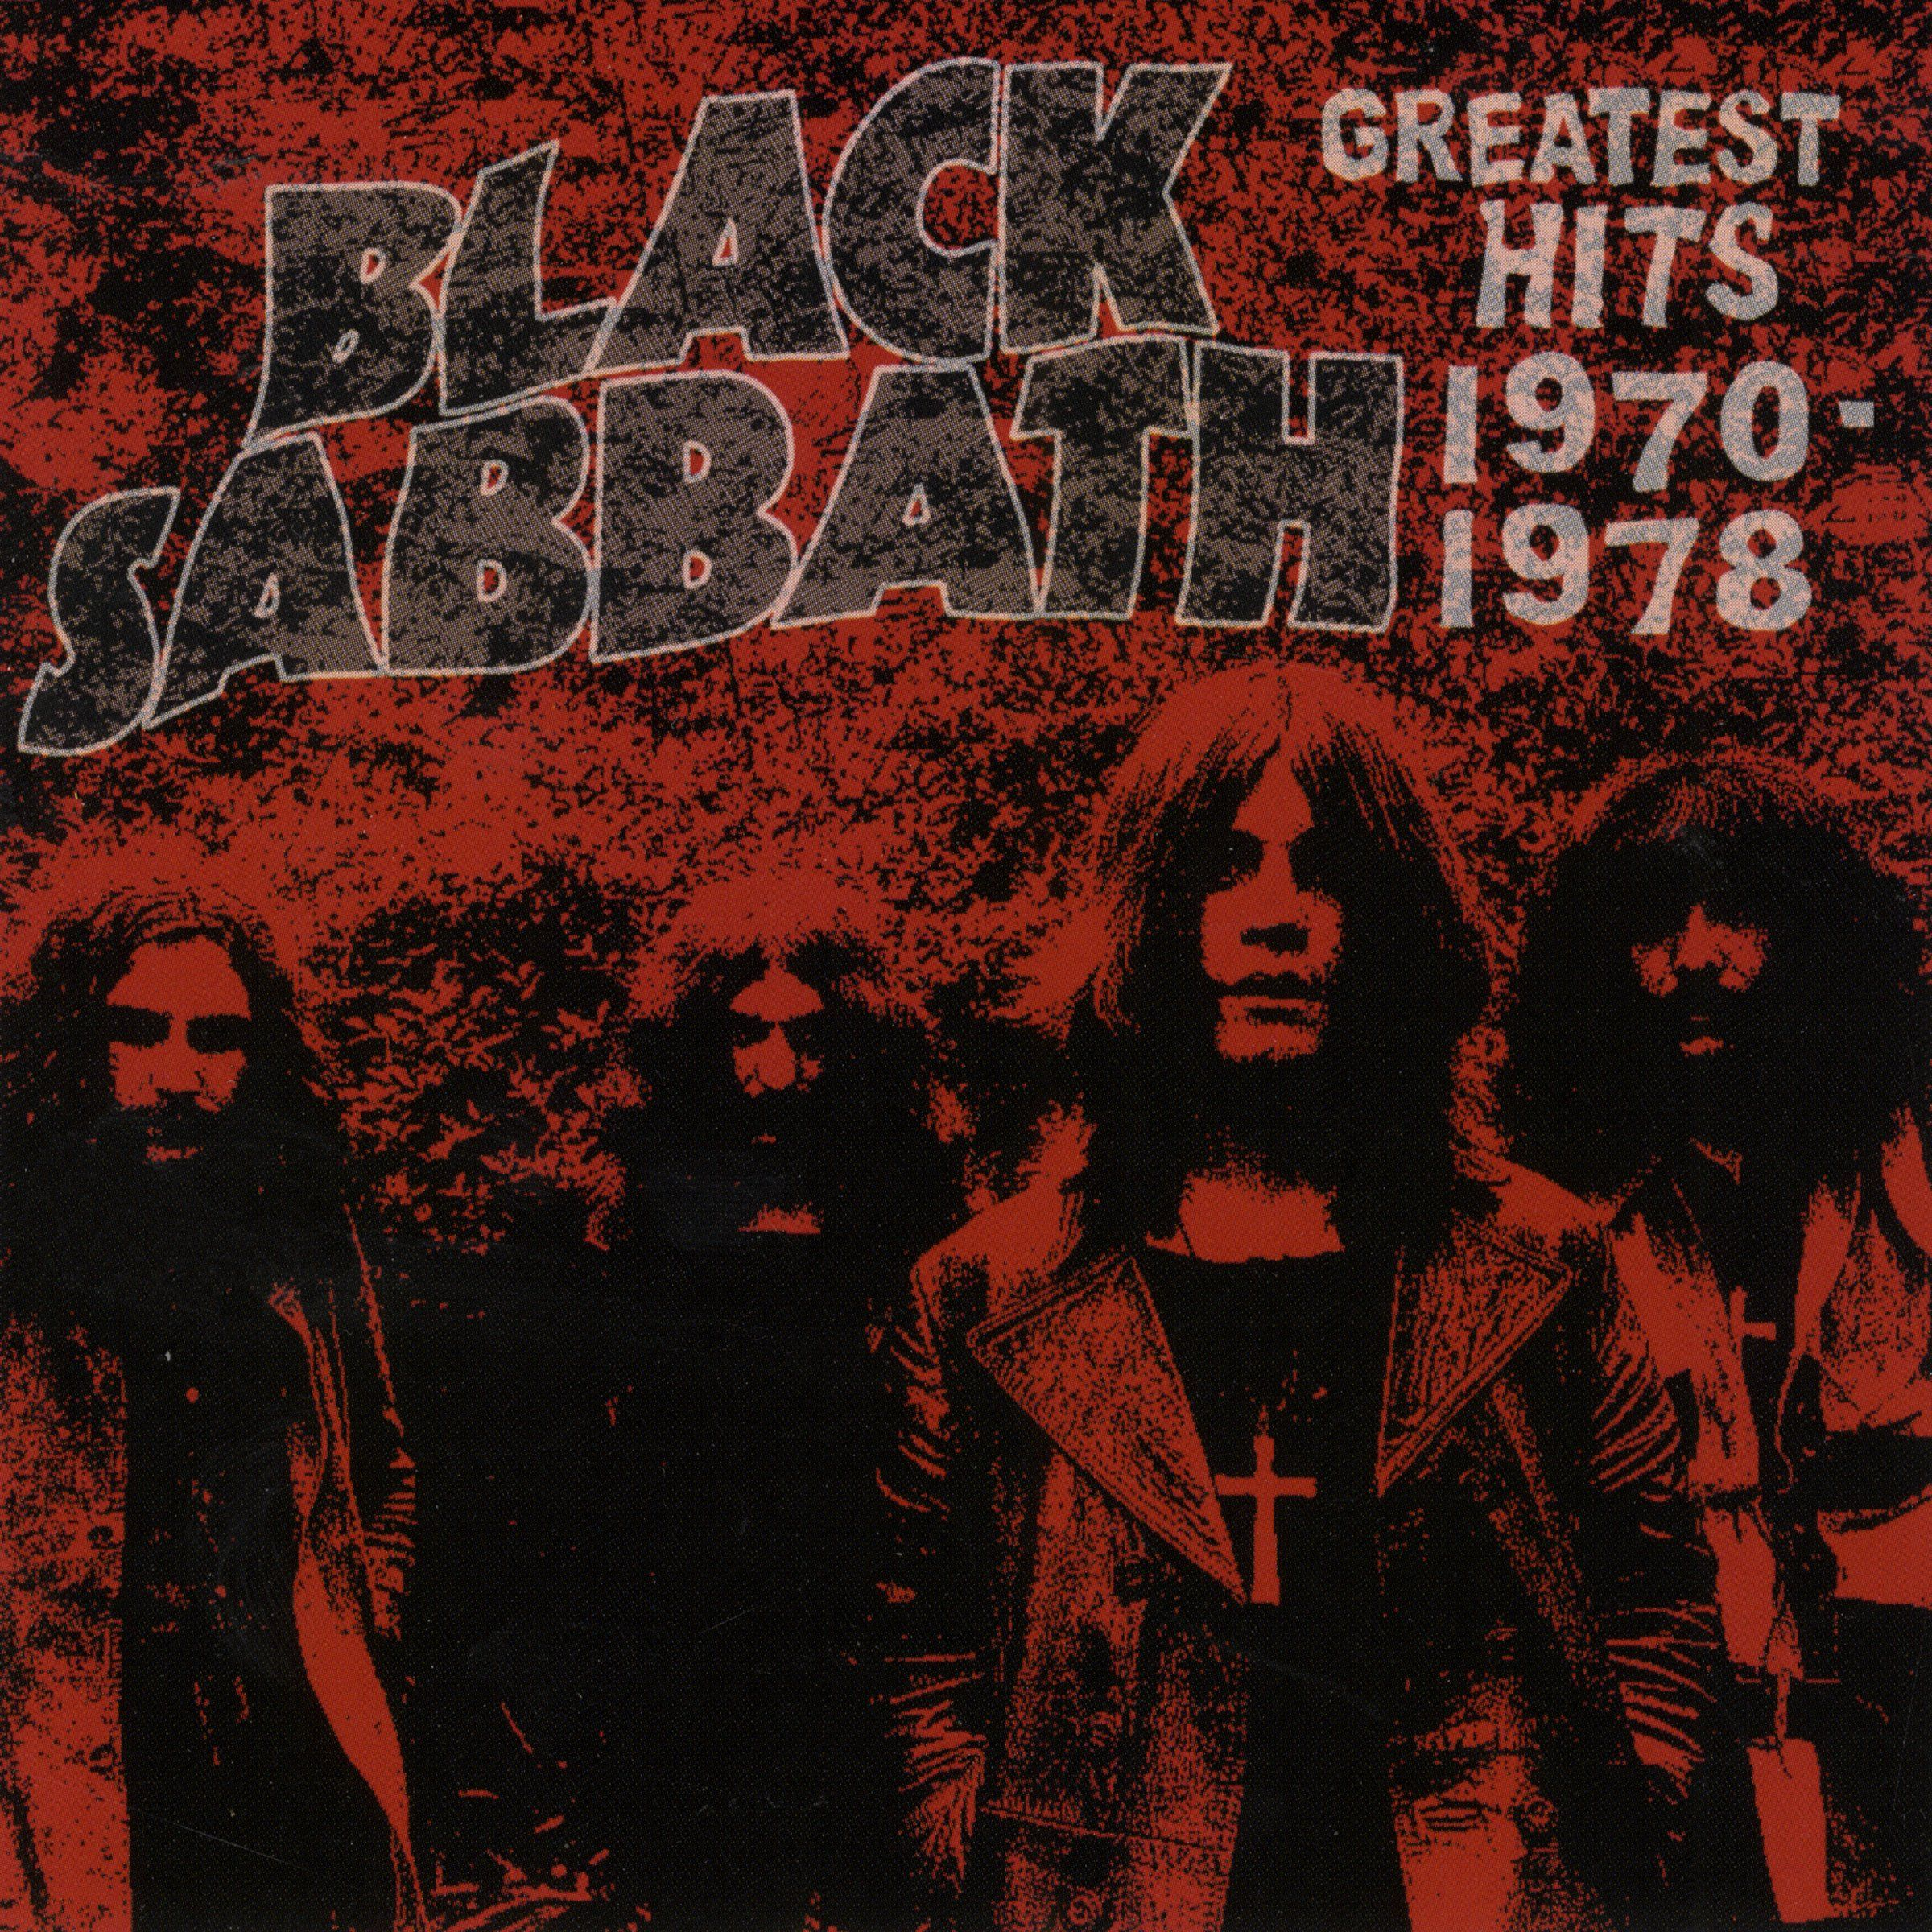 Black Sabbath - Greatest Hits 1970-1978 album cover